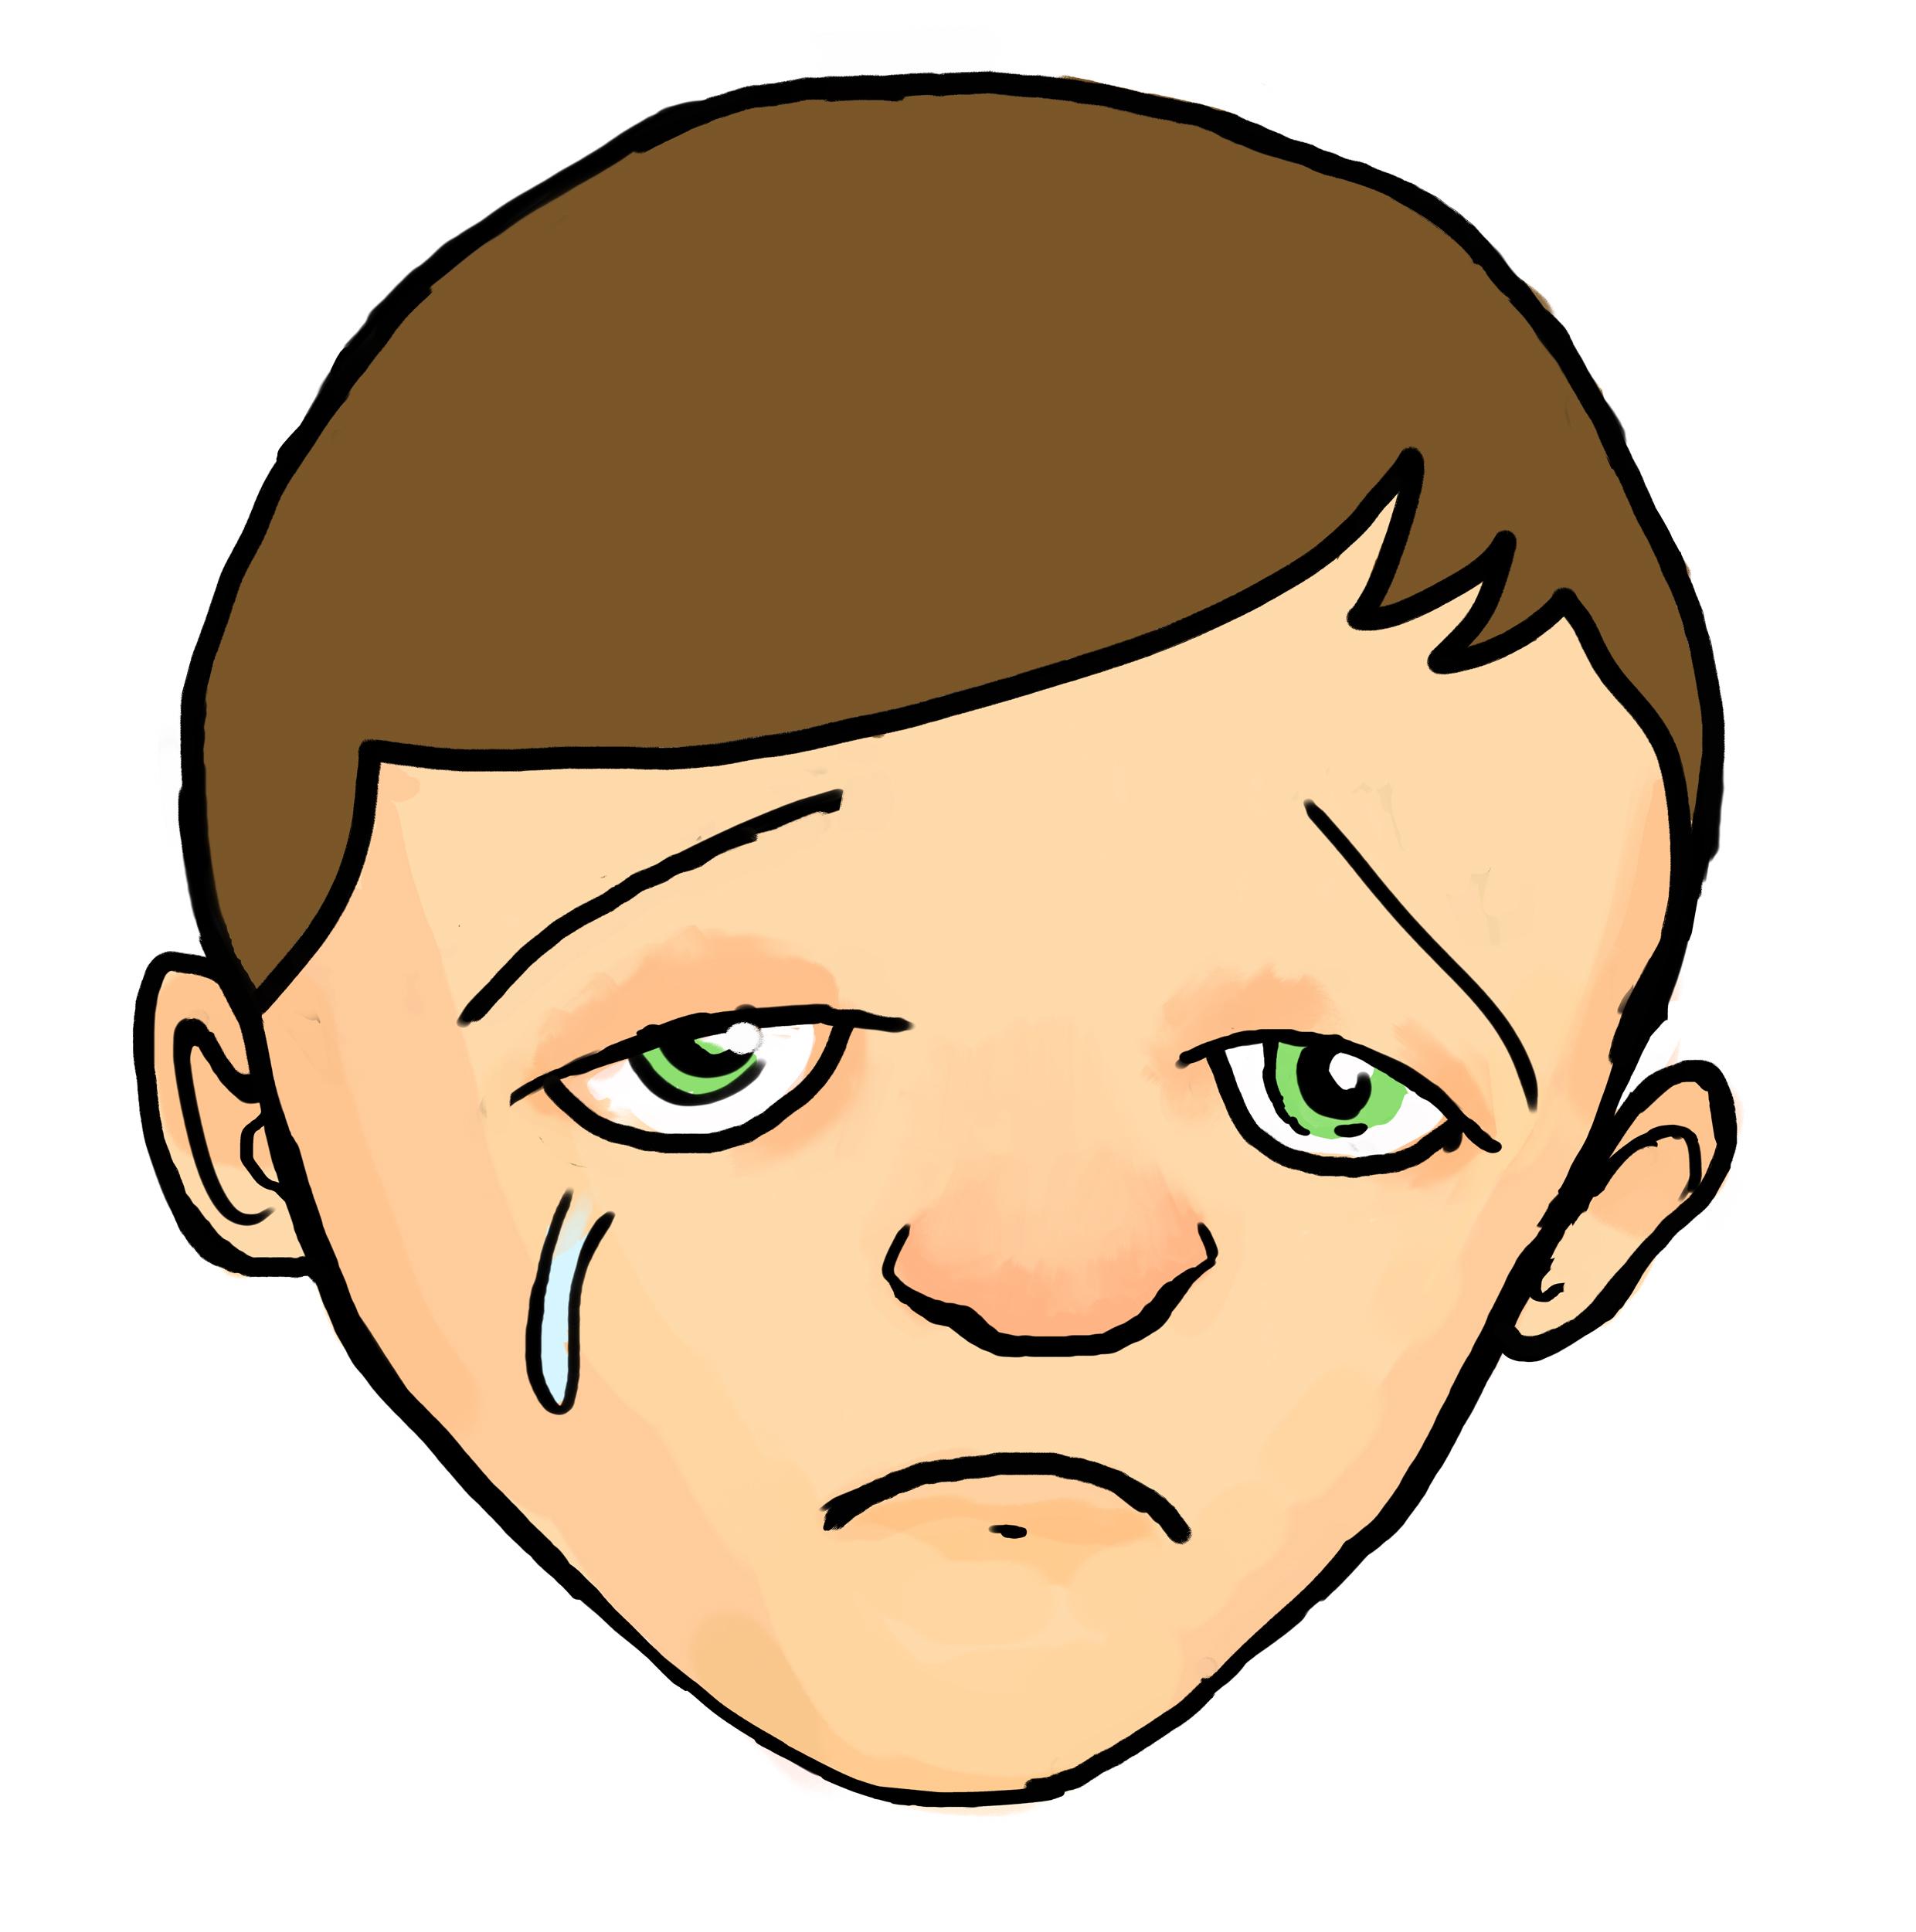 Emotions clipart sad guy. Free download clip art